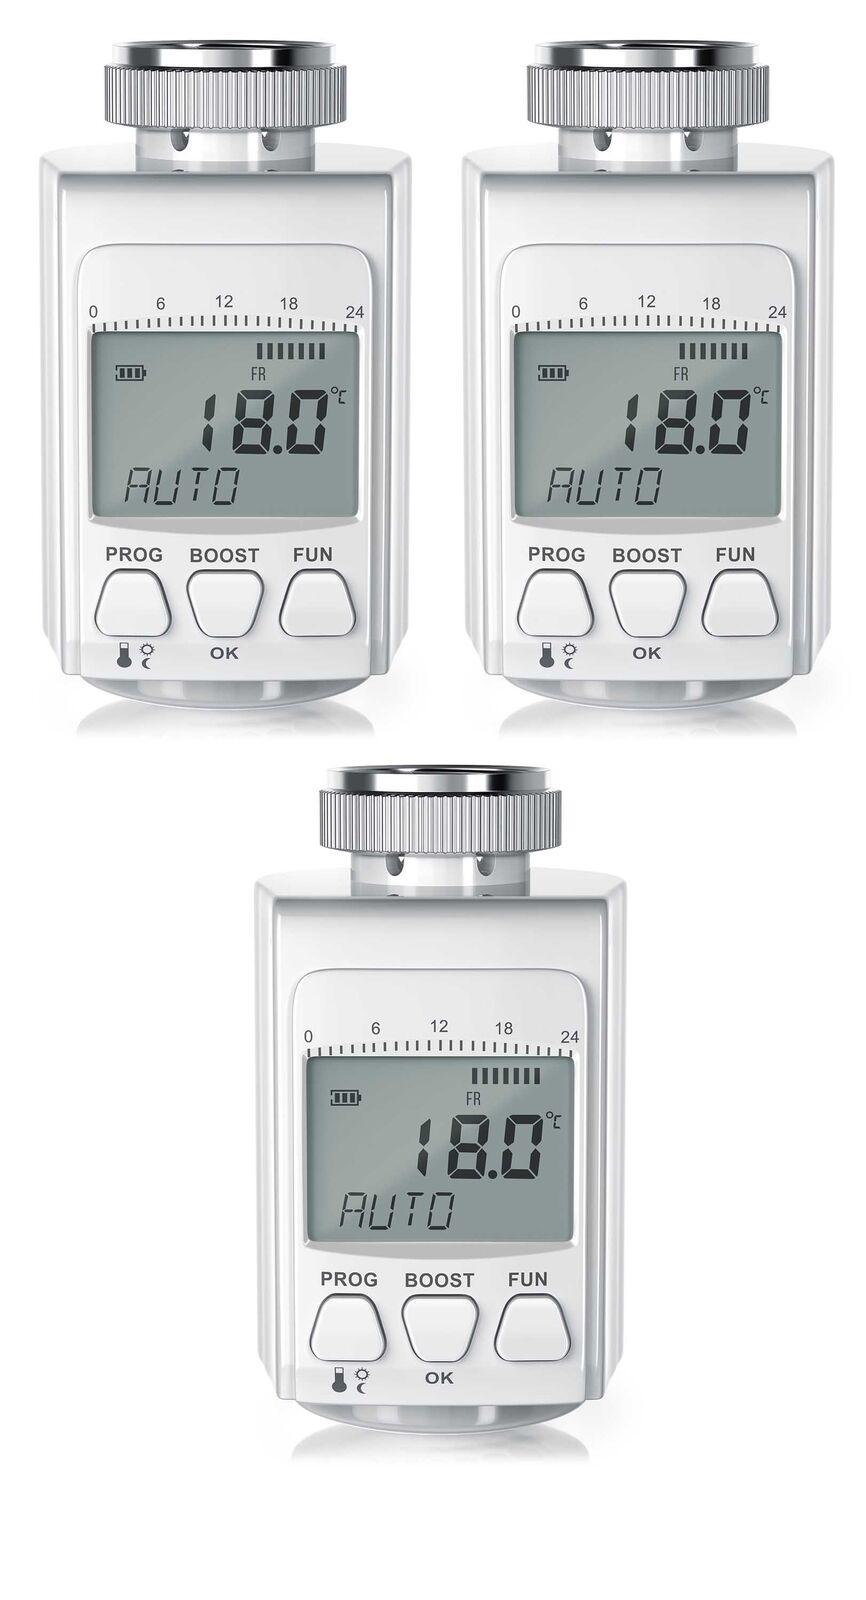 3x Bearware Komfort - Heizkörperthermostat | Energiespar-Regler| Thermostat /NEU